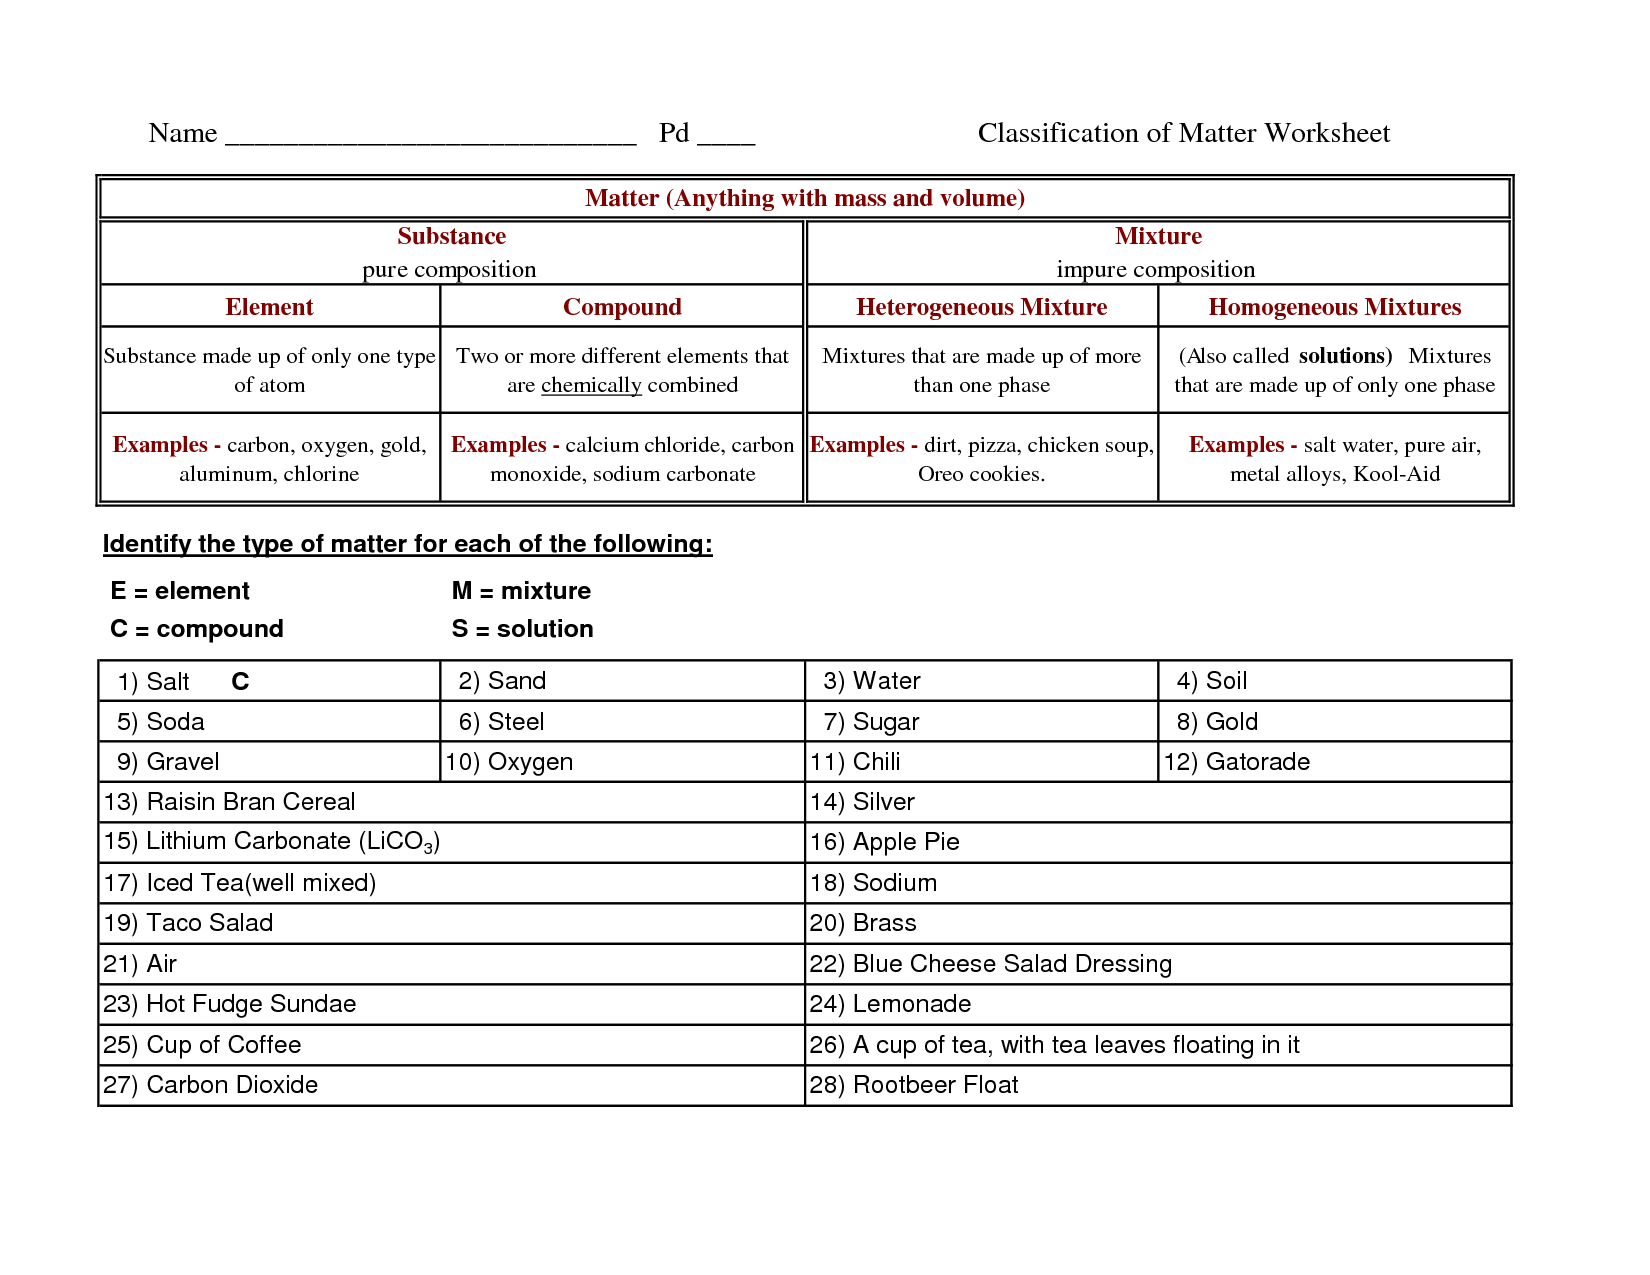 small resolution of Heterogeneous Vs Homogeneous Worksheet   Printable Worksheets and  Activities for Teachers